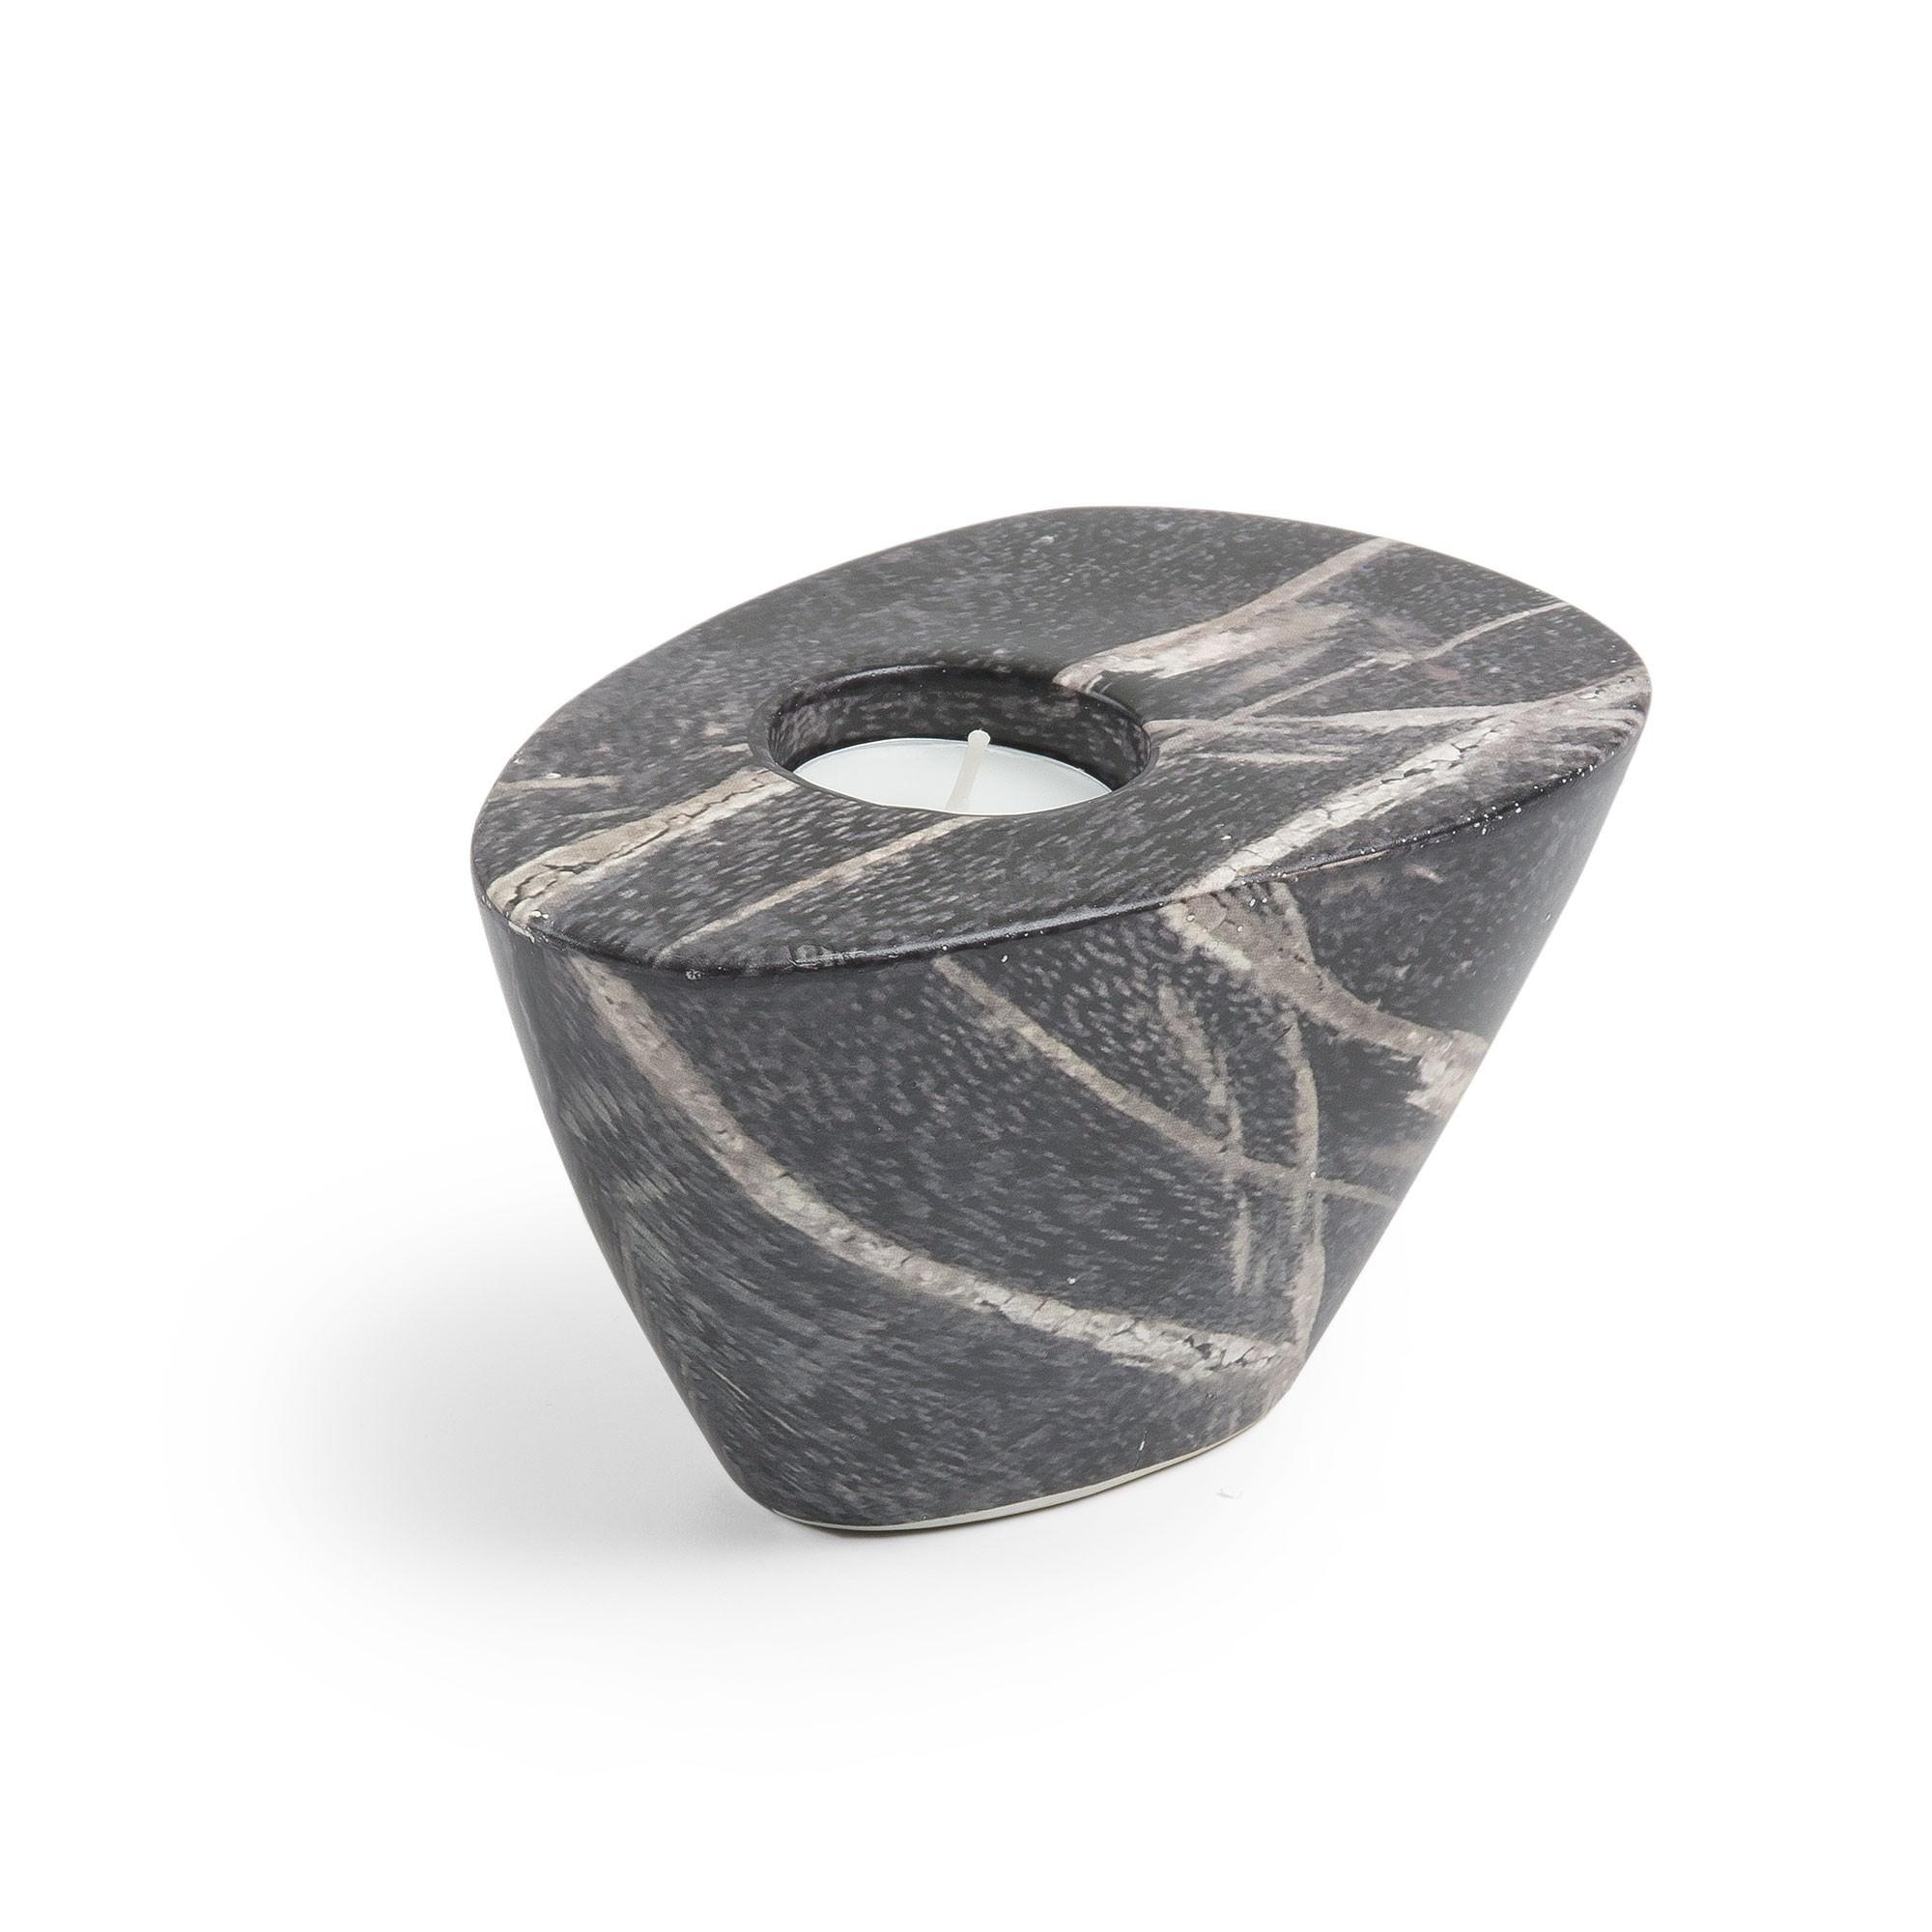 Maloney Ceramic Tealight Holder, Dark Marble